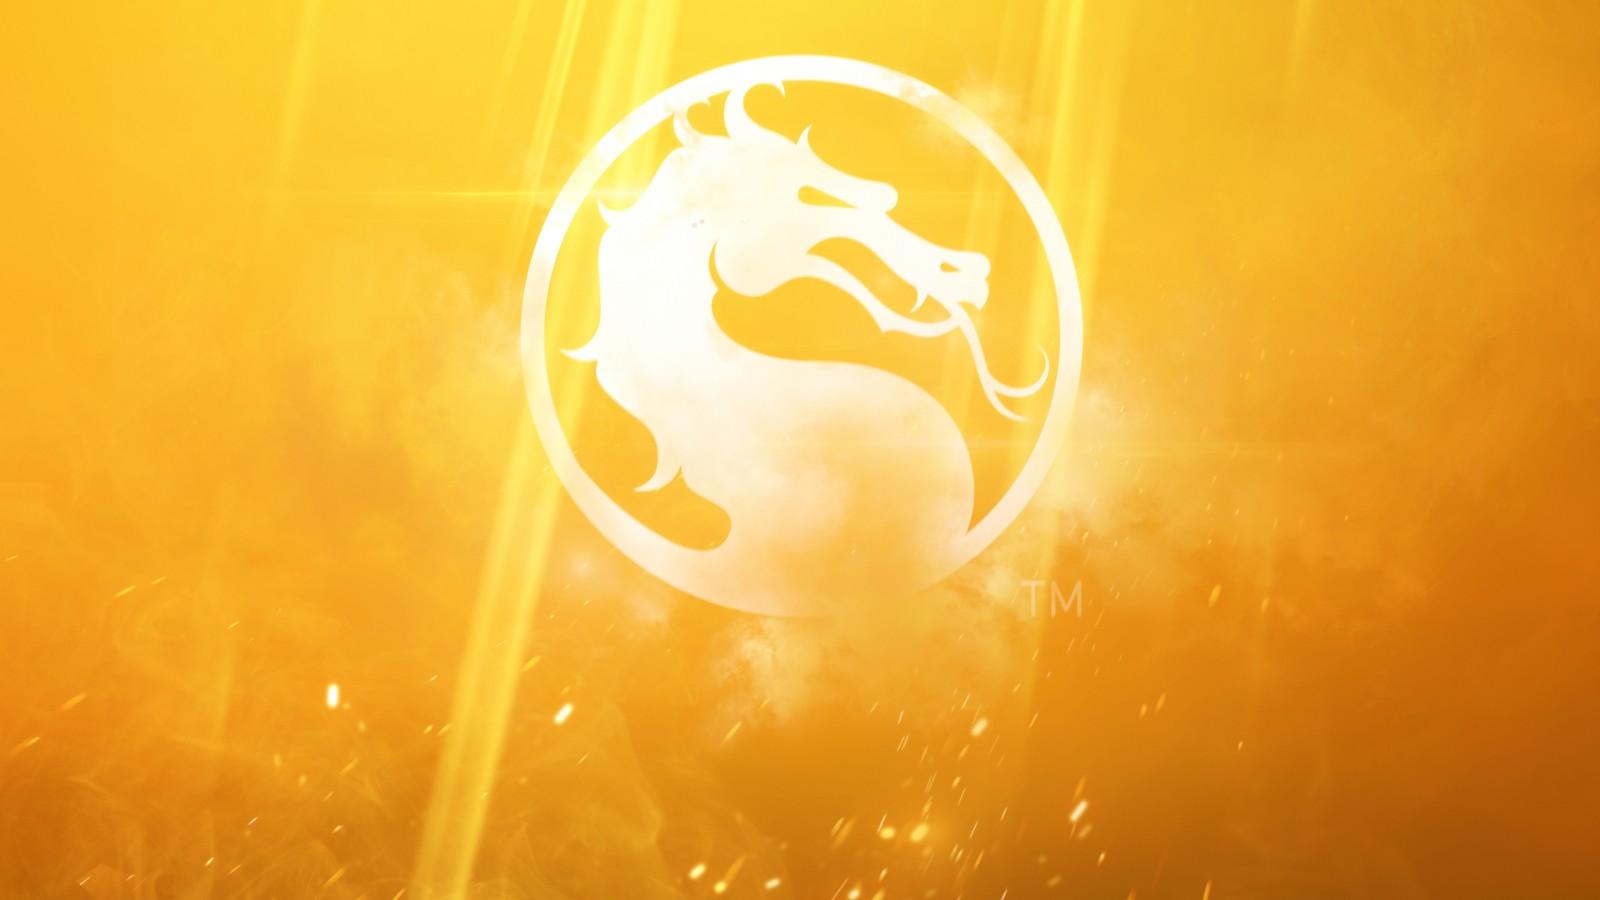 Mortal Kombat X Wallpapers Hd Iphone Mortal Kombat 11 4k 8k Wallpapers Hd Wallpapers Id 28325